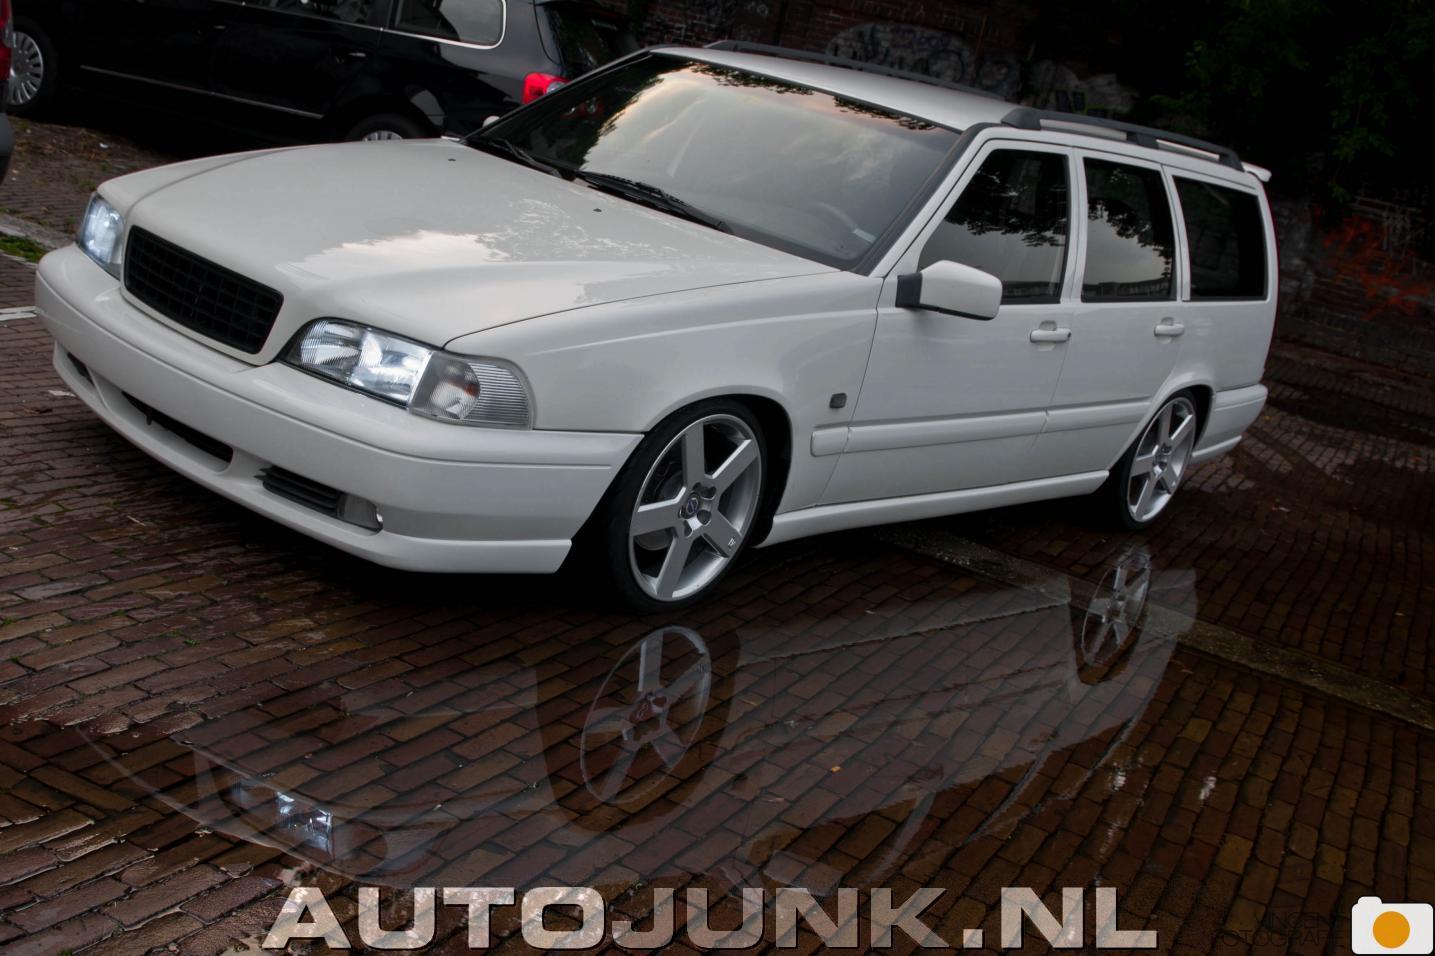 Volvo V70 T5 Photoshoot Fotos Autojunknl 78664